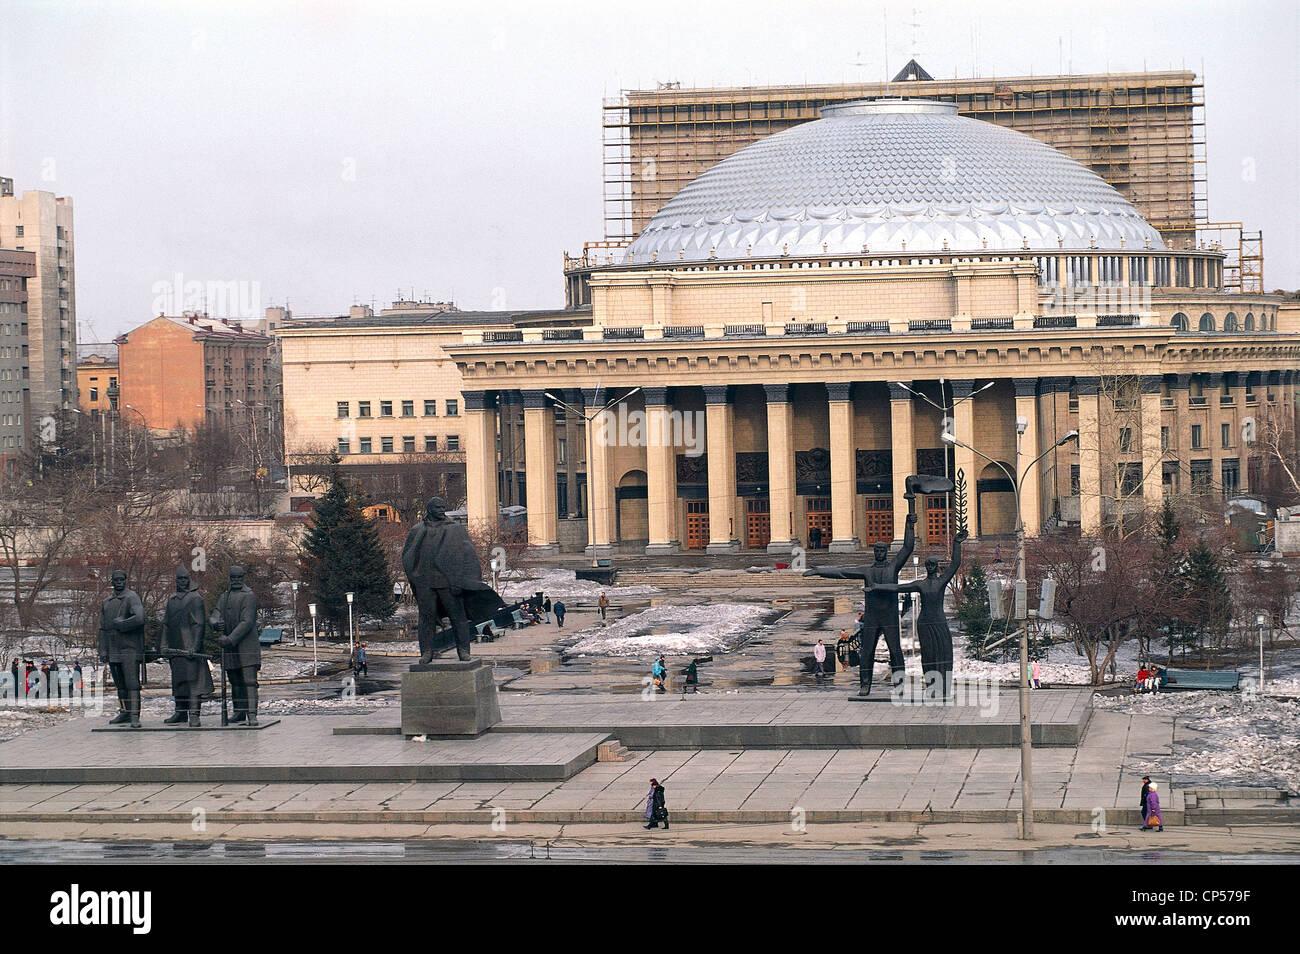 Russia Siberia Novosibirsk. Lenin Square (Ploshchad 'Lenina), Opera Ballet Theatre (Teatr opery Baleta, 1931-45) Stock Photo